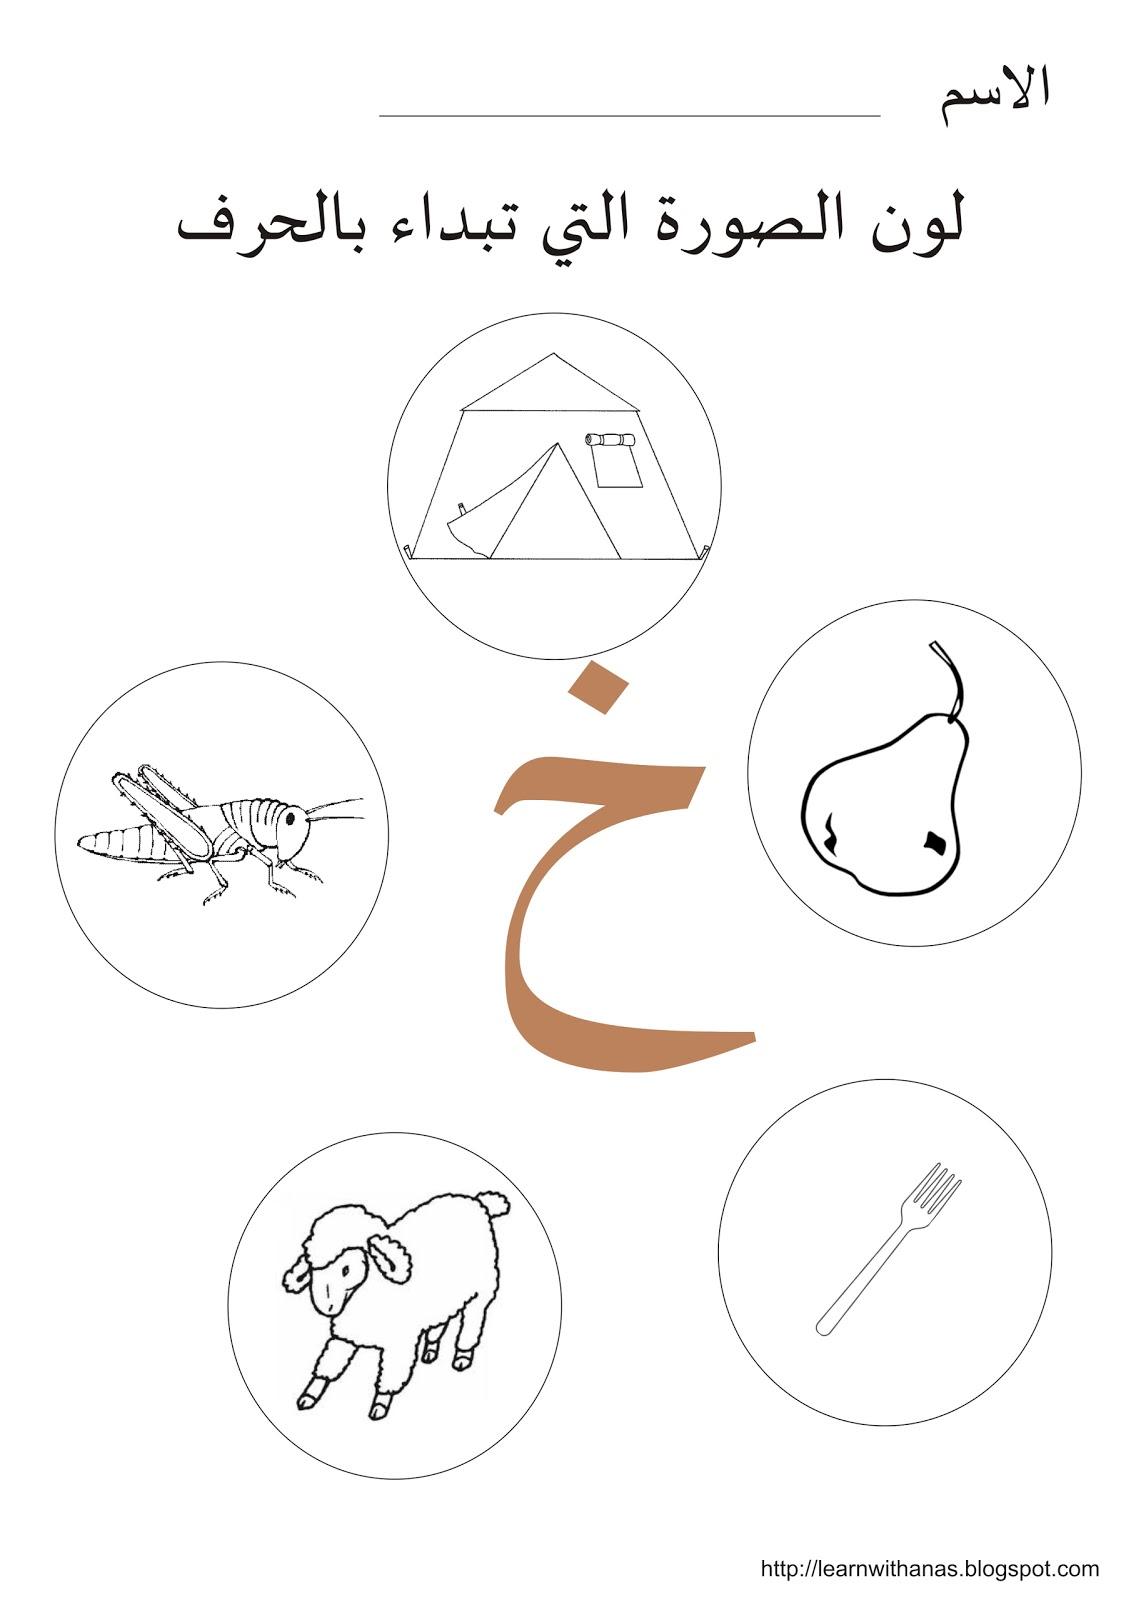 Arabic Homeschool Image By Sumaya